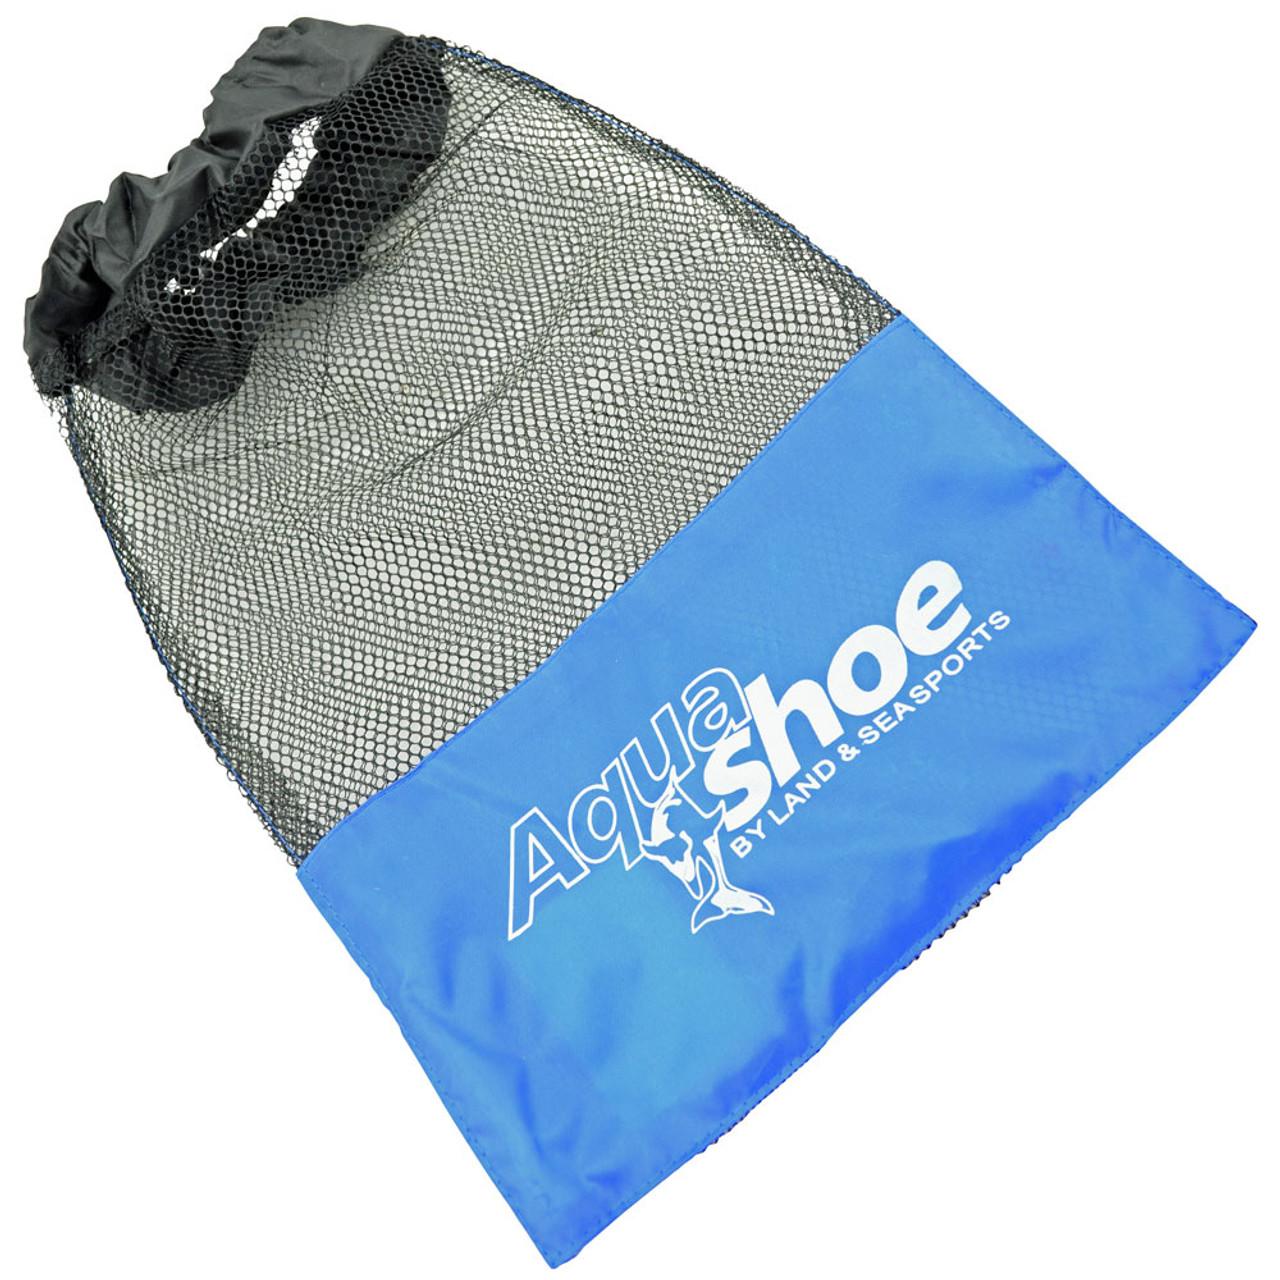 e19d32b701 ... Land And Sea Aqua Shoes Underwater Shoes Beach Shoes ...